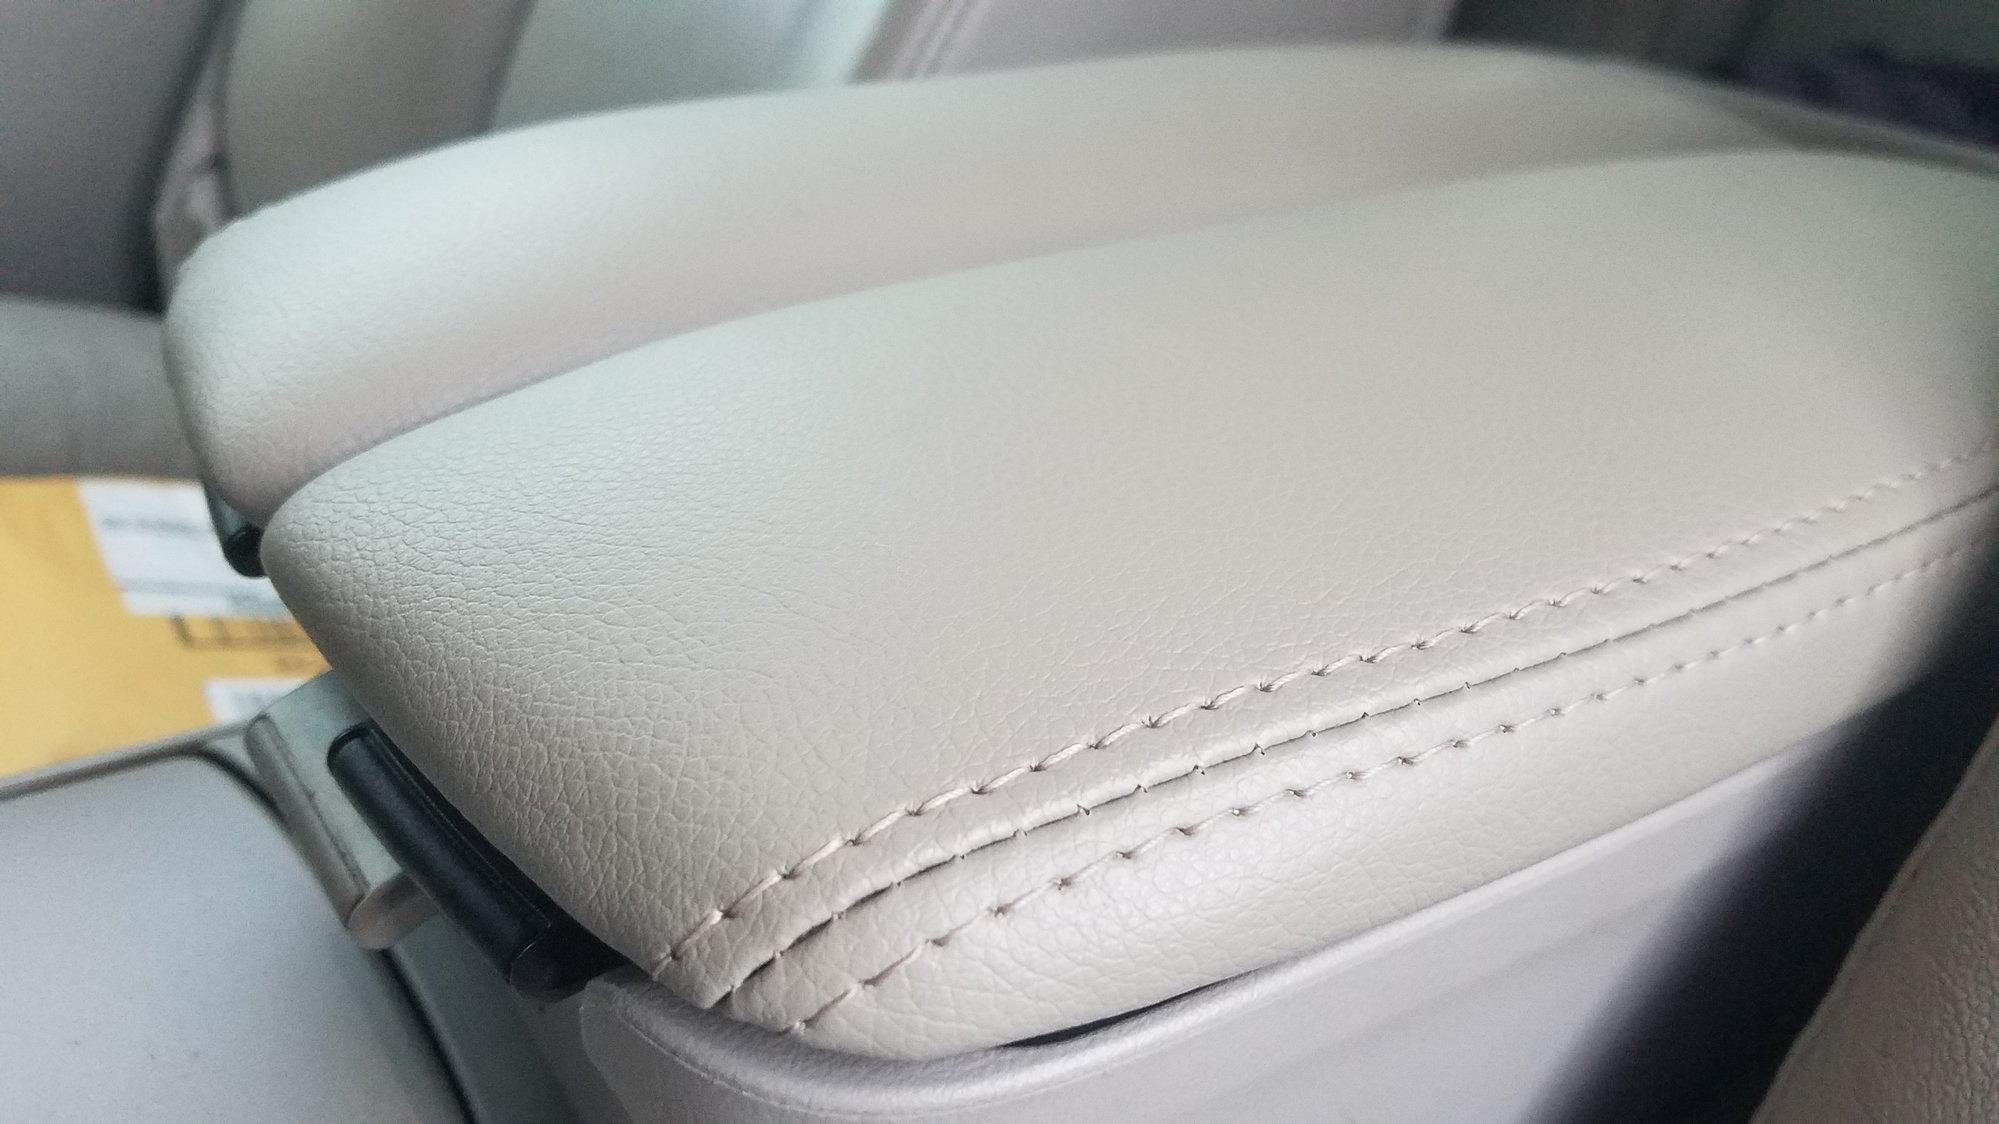 2014 RDX replacing center armrest console lock/latch